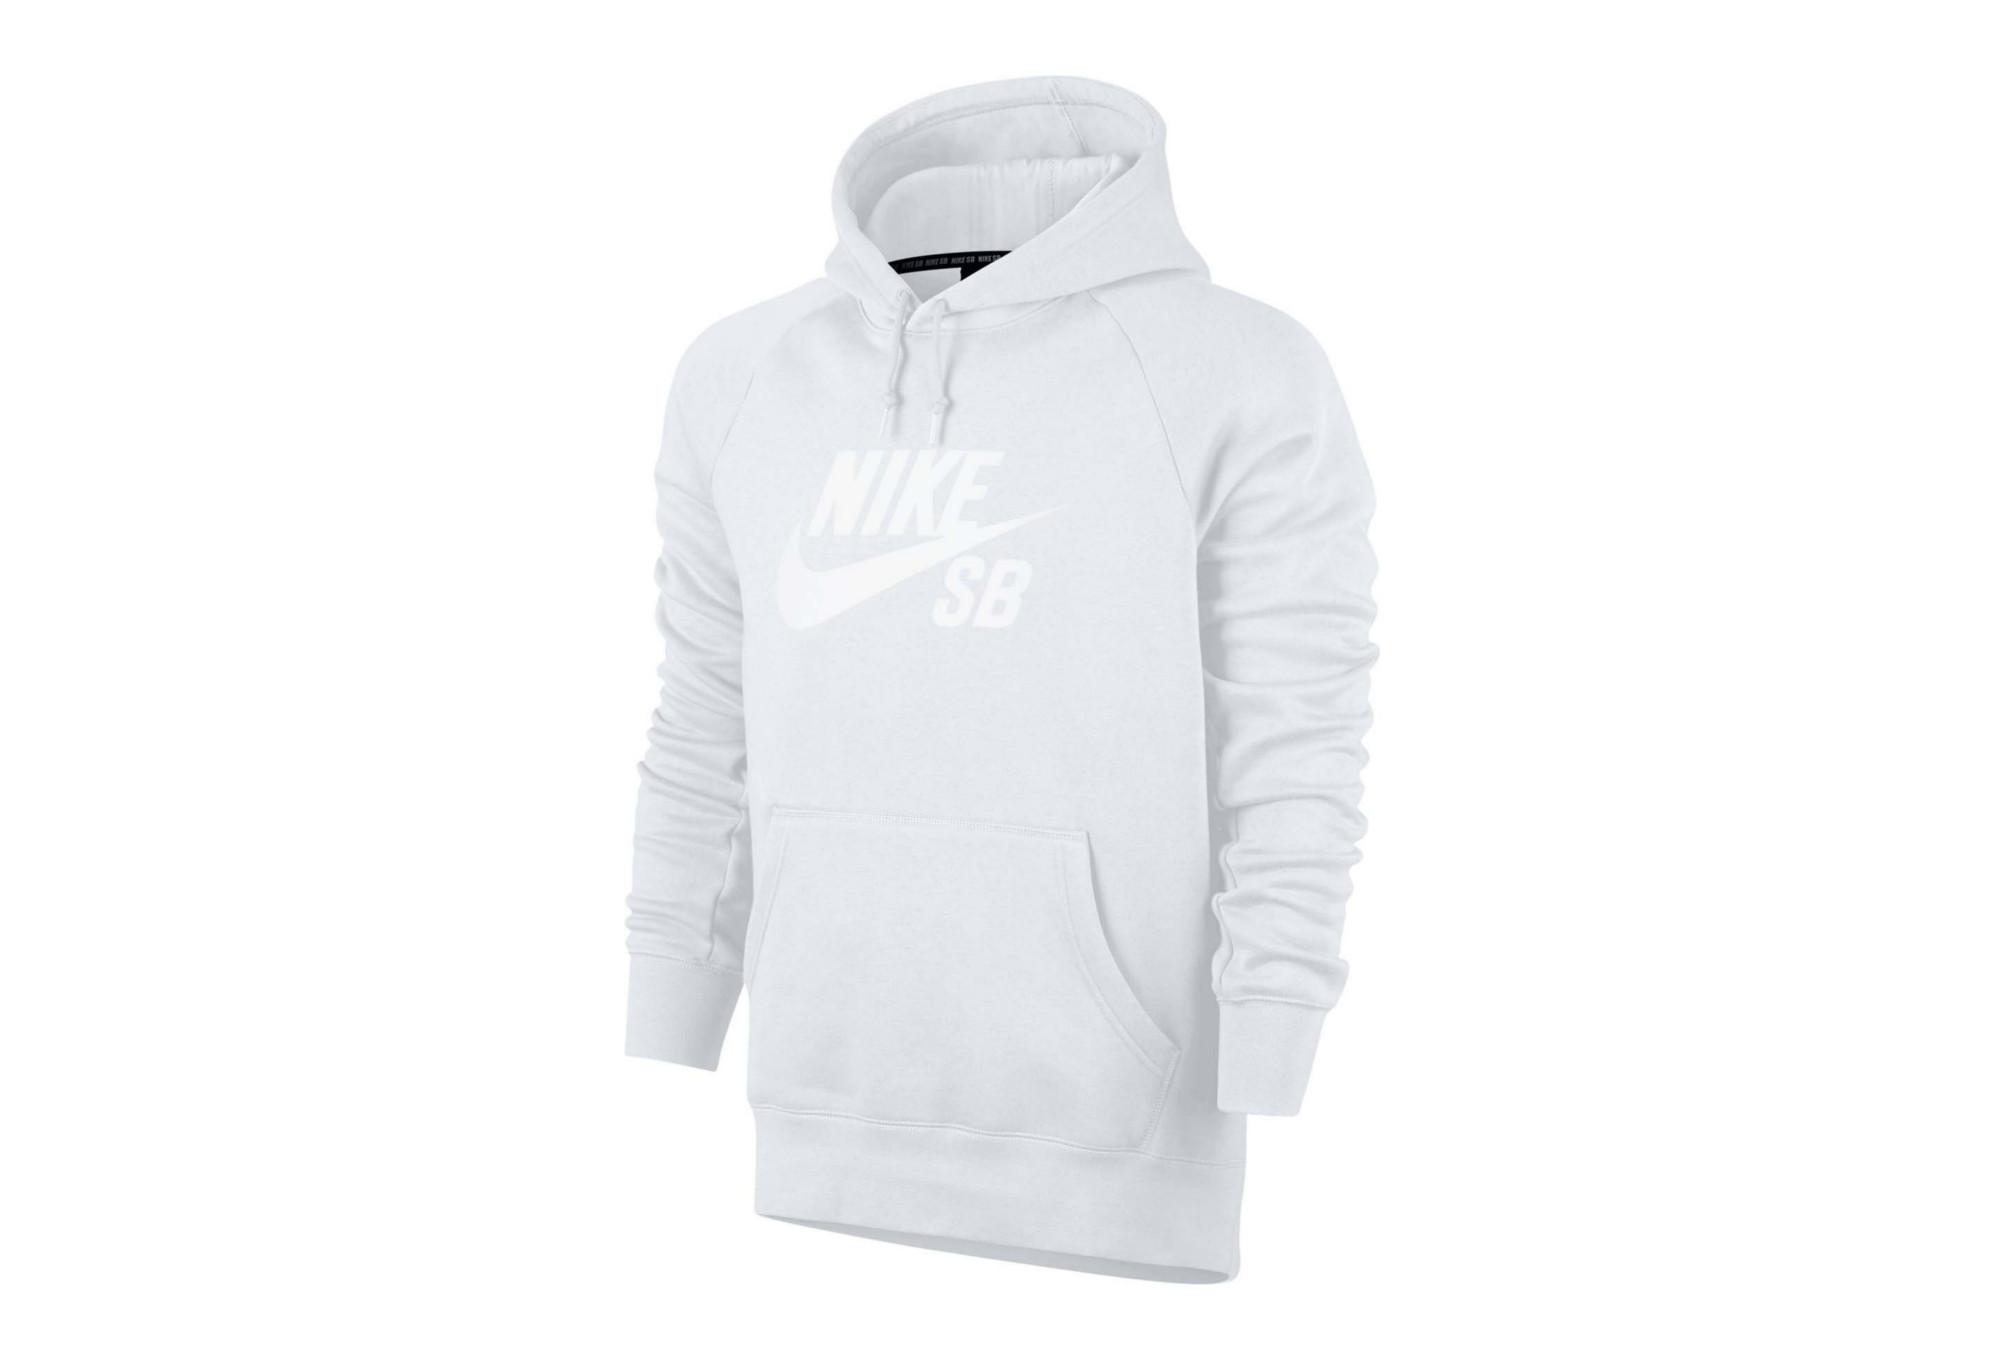 Sudadera Nike Icon Capucha Con Sb Blanca 35j4RLqA